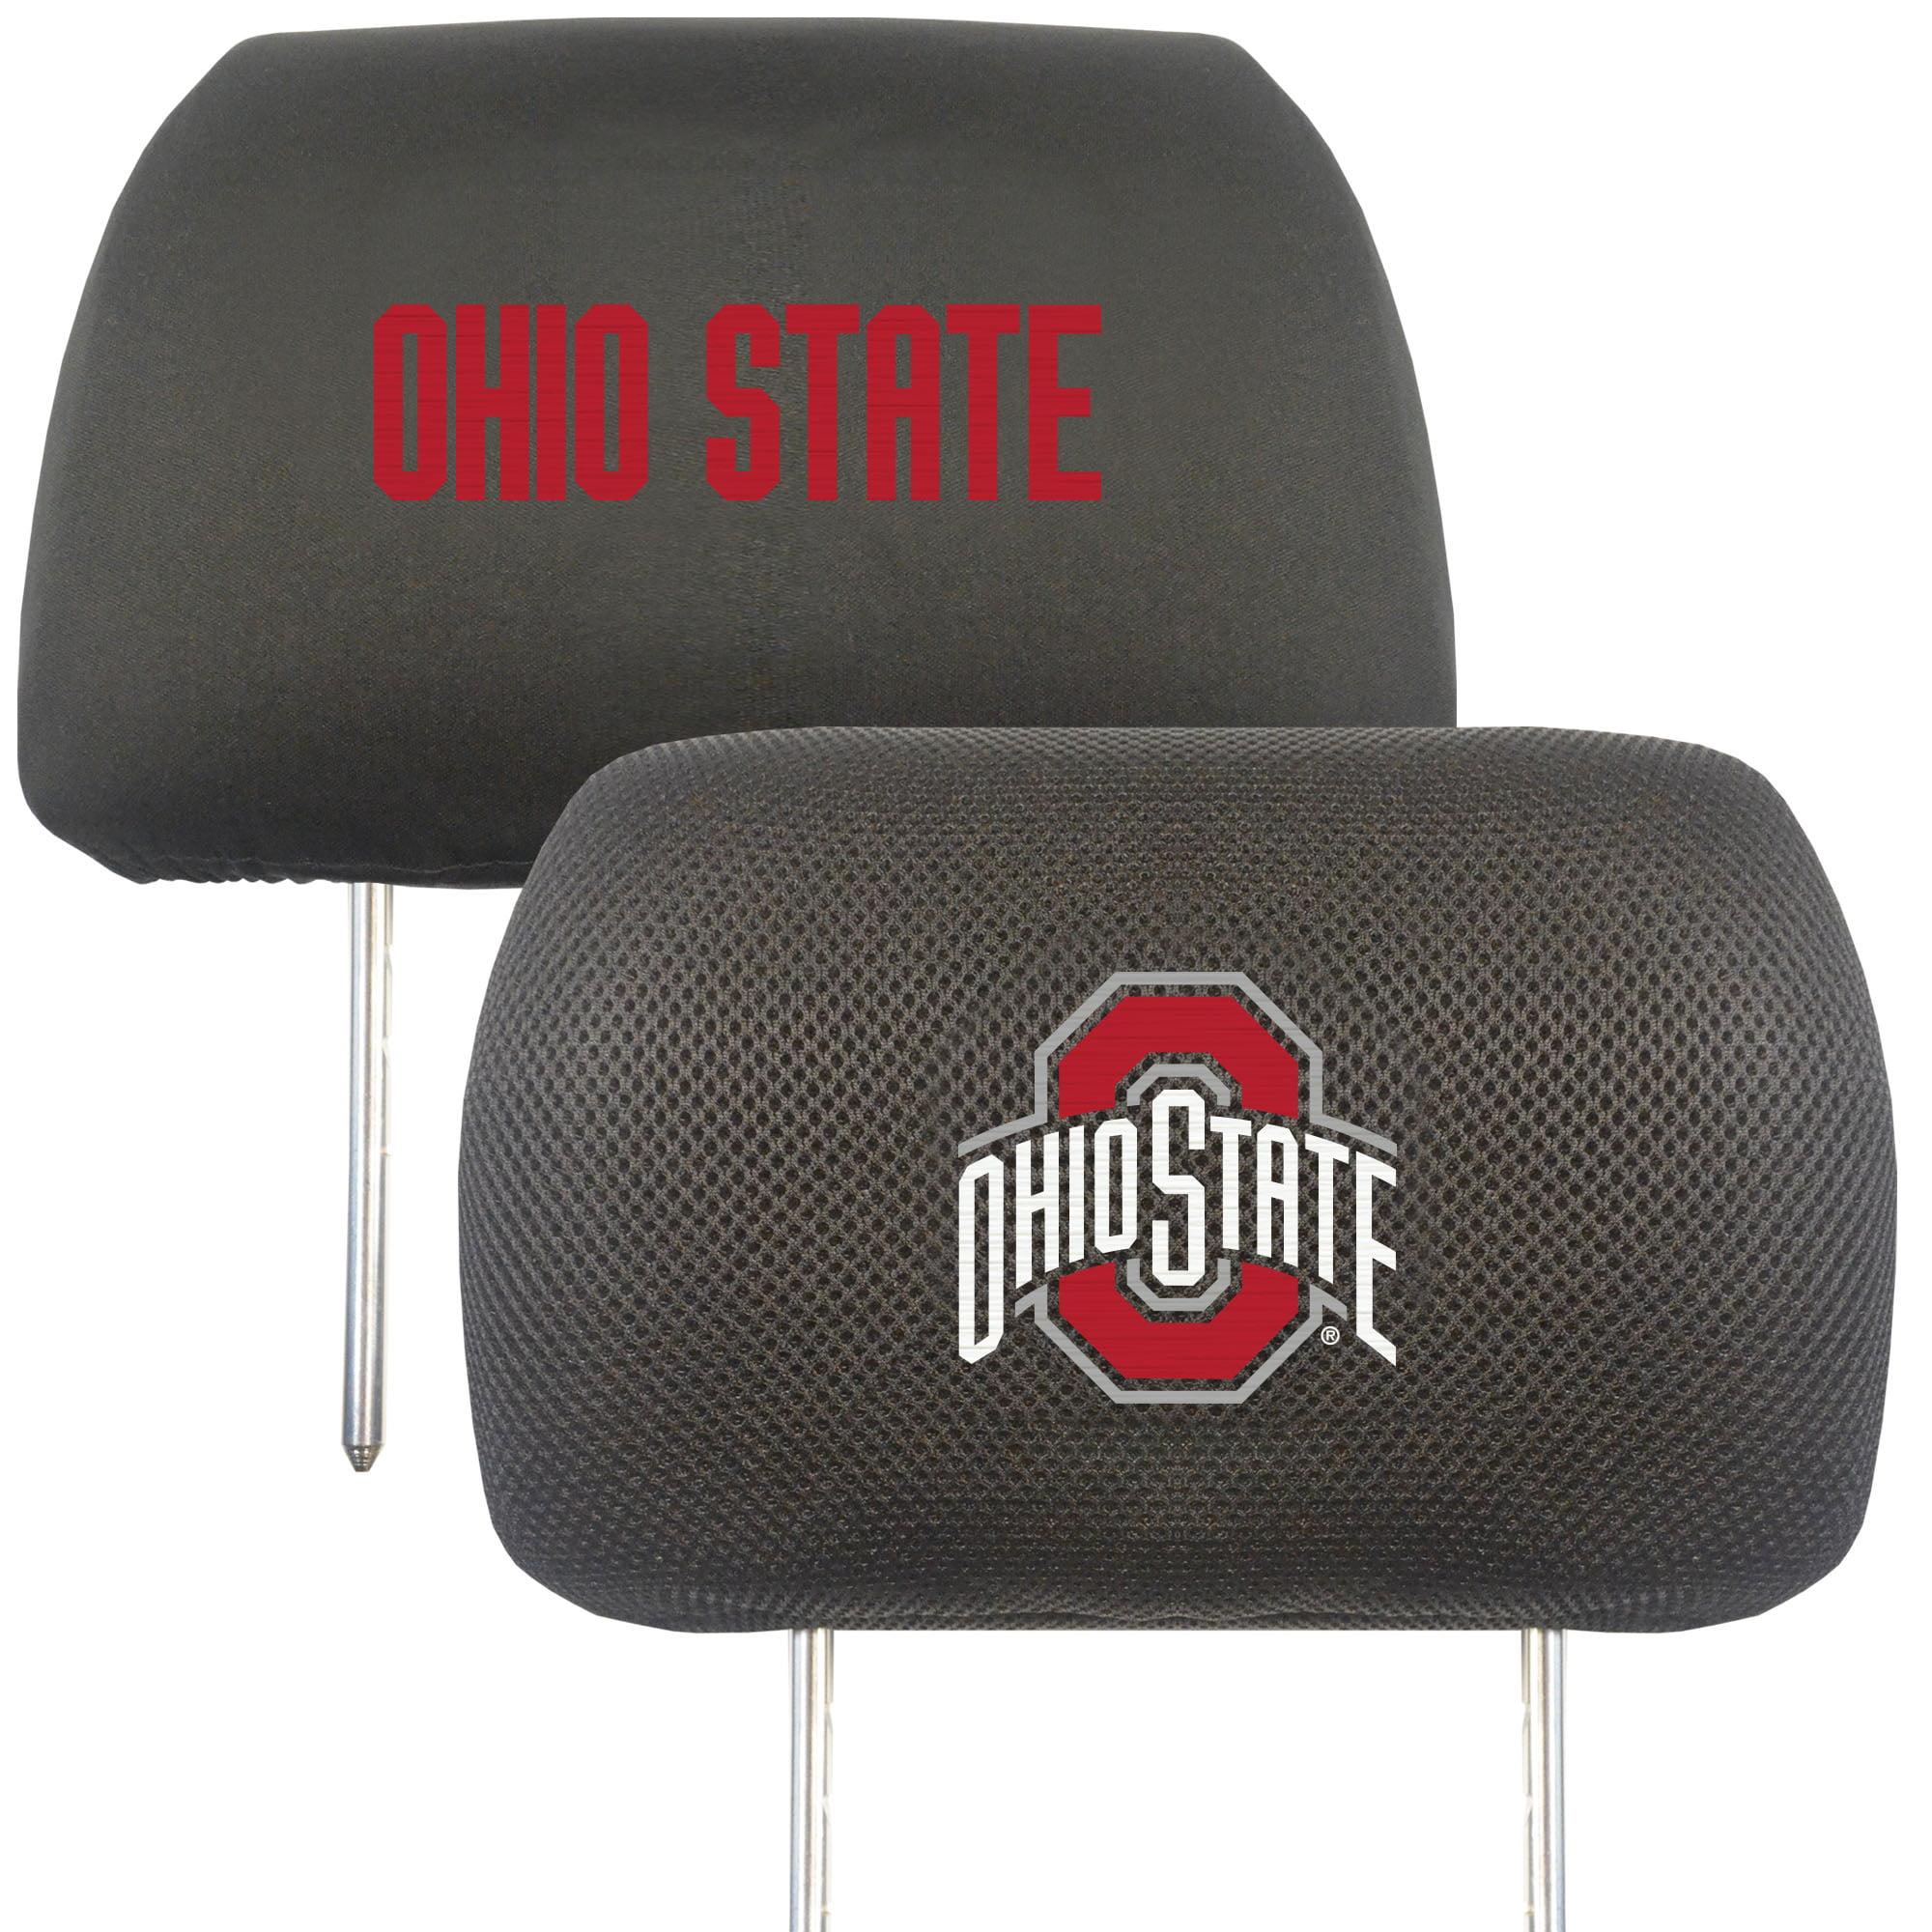 NCAA Ohio State University Buckeyes Head Rest Cover Automotive Accessory